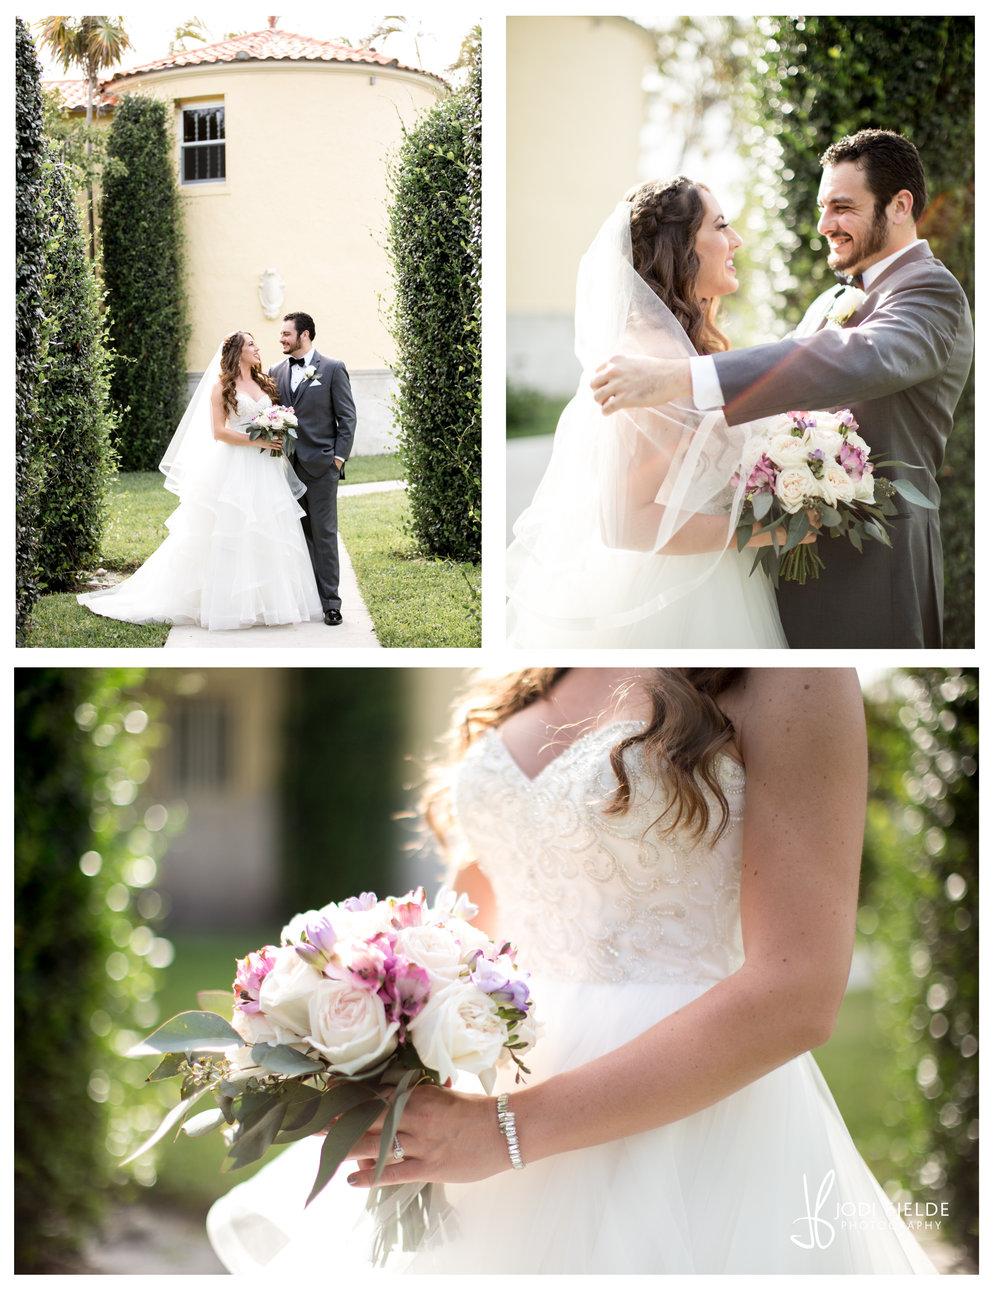 Boynton_Beach_Florida_ Benvenuto_Wedding_Heather__Doug_Married_7.jpg